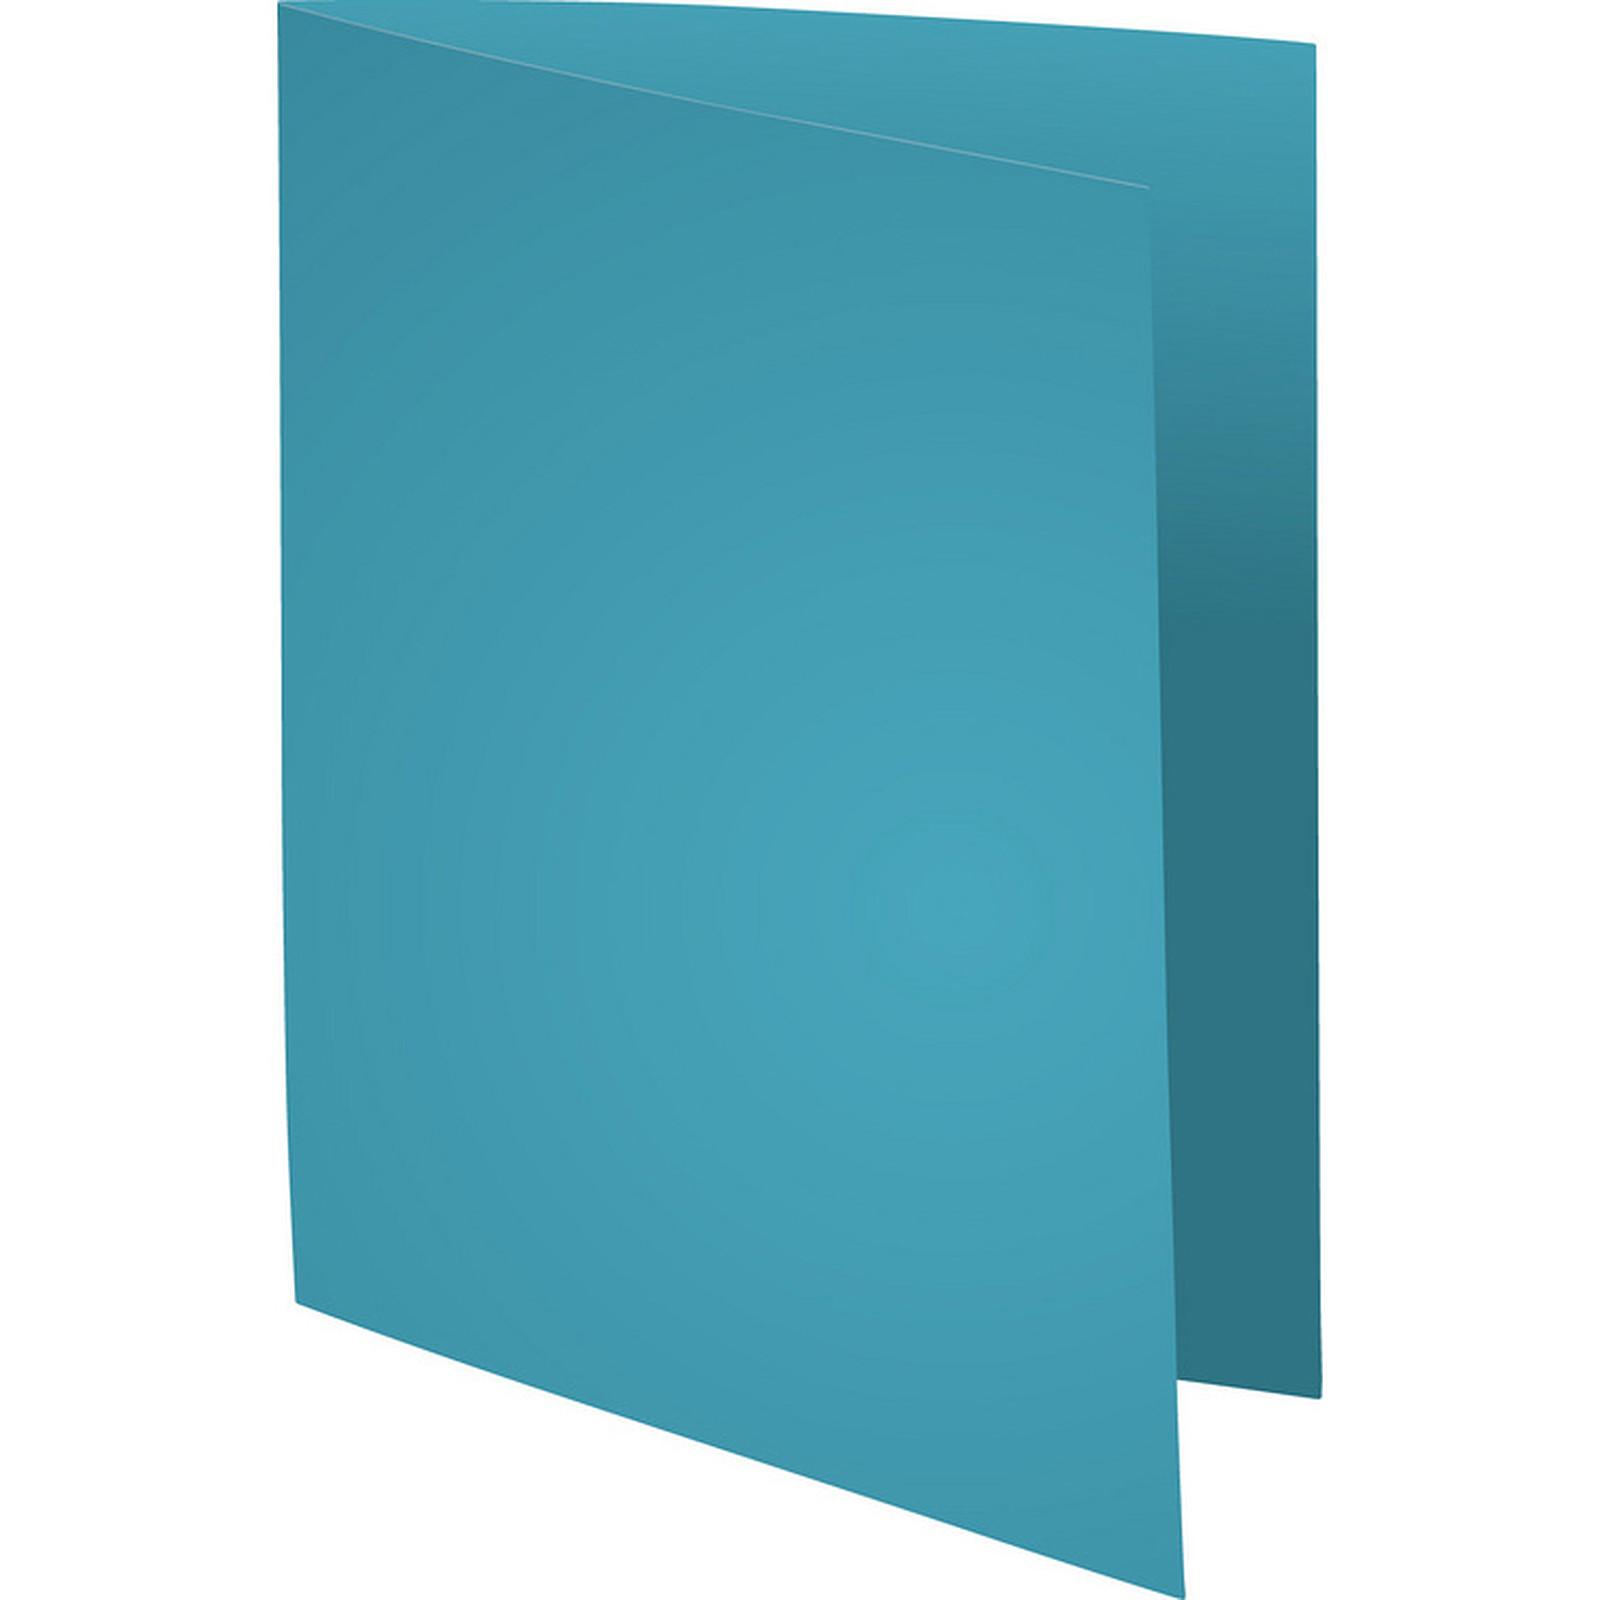 Exacompta Sous chemises Bengali 60g Bleu clair x 250